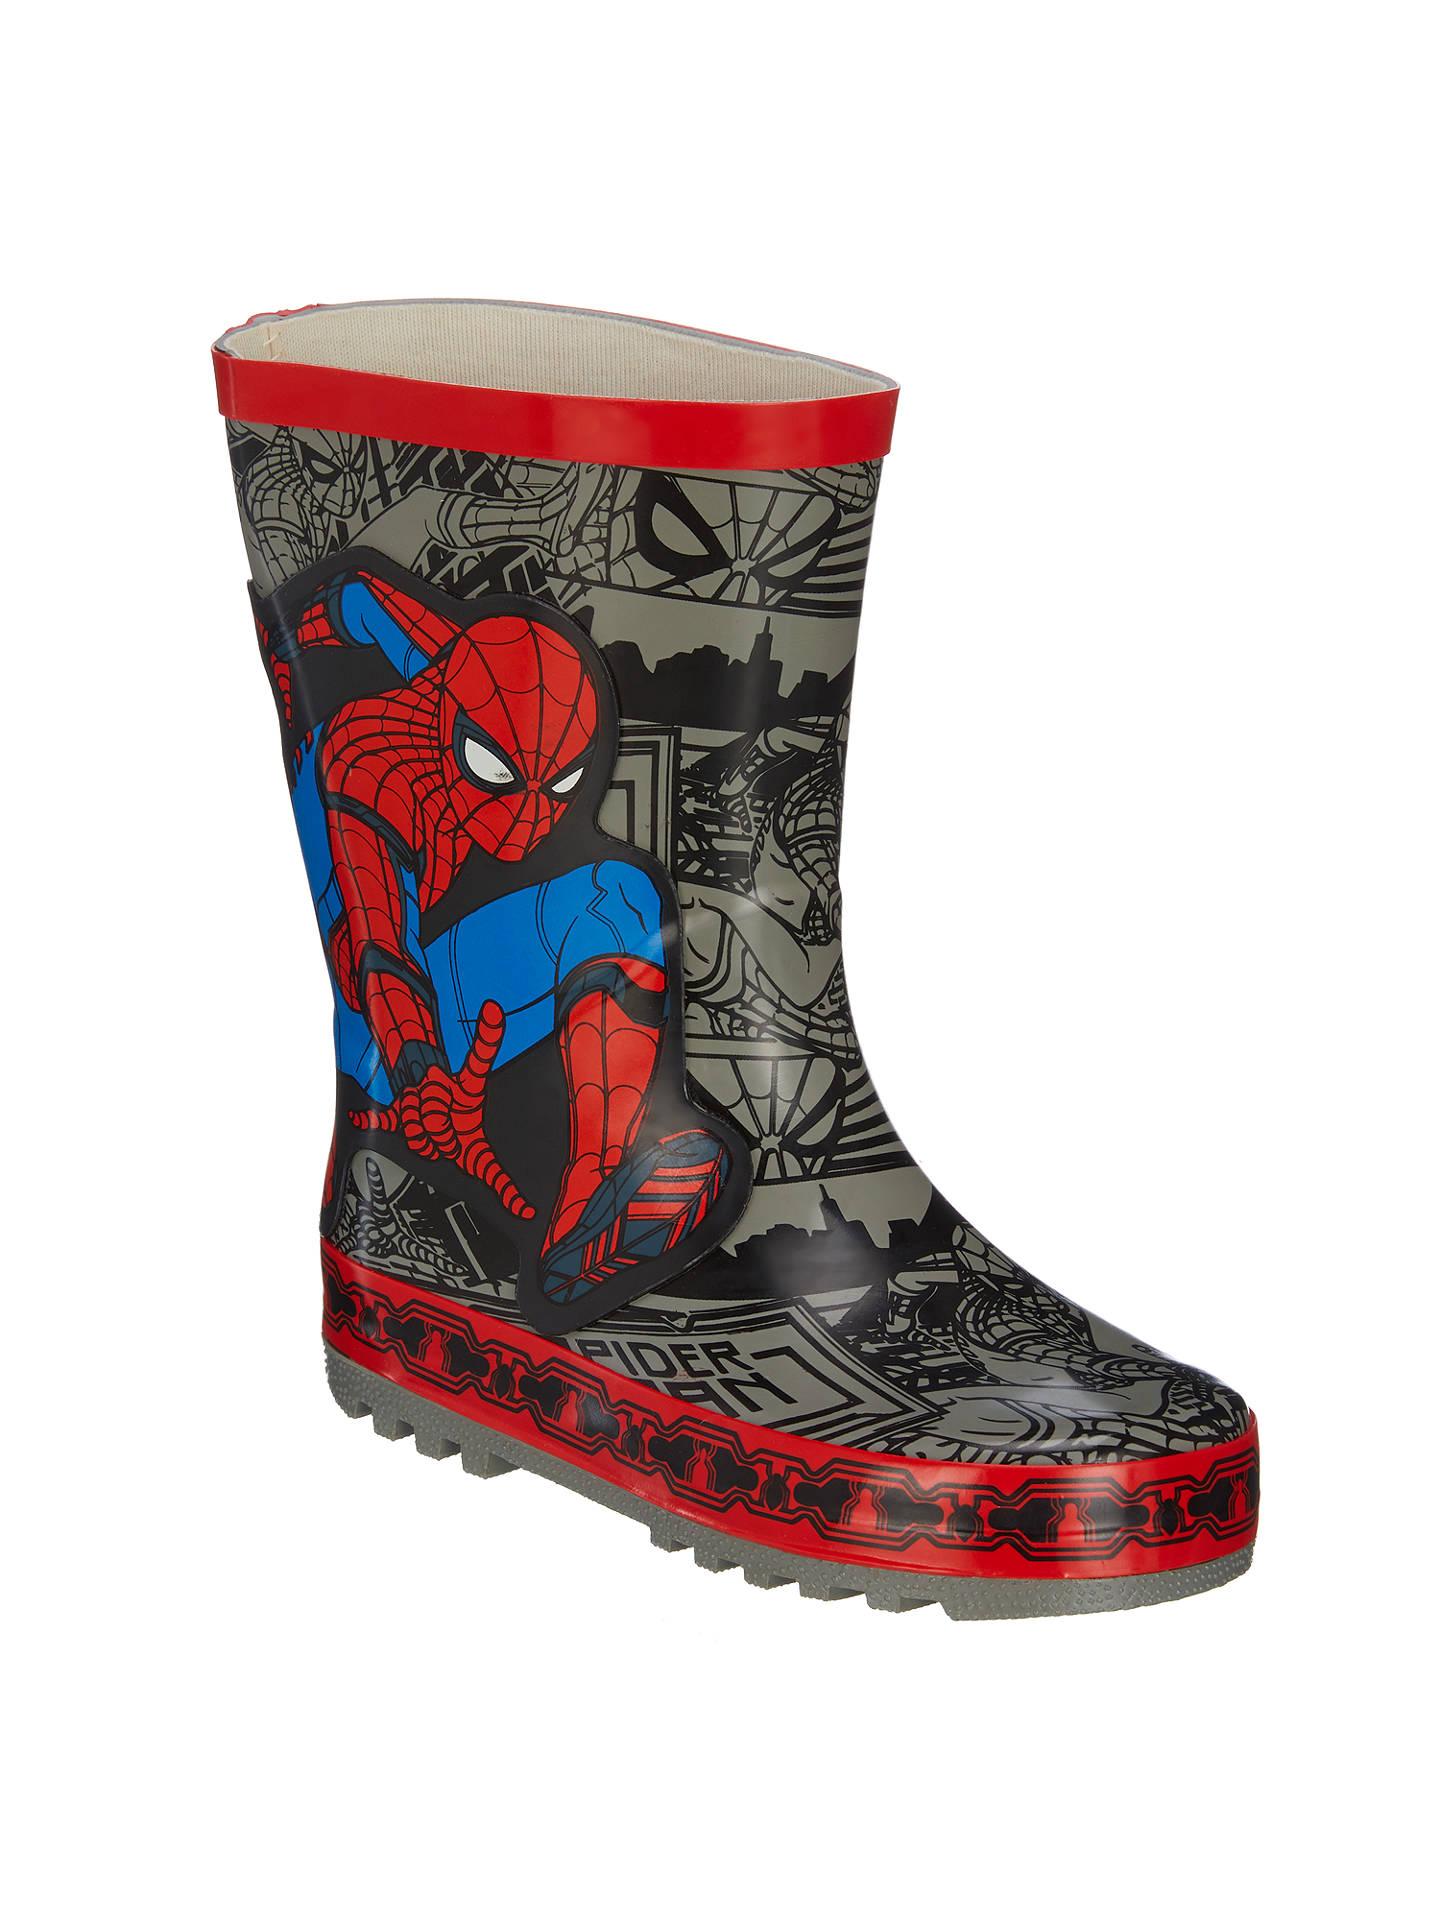 a86e1803d1d Spider-Man Children's Wellington Boots, Grey at John Lewis & Partners